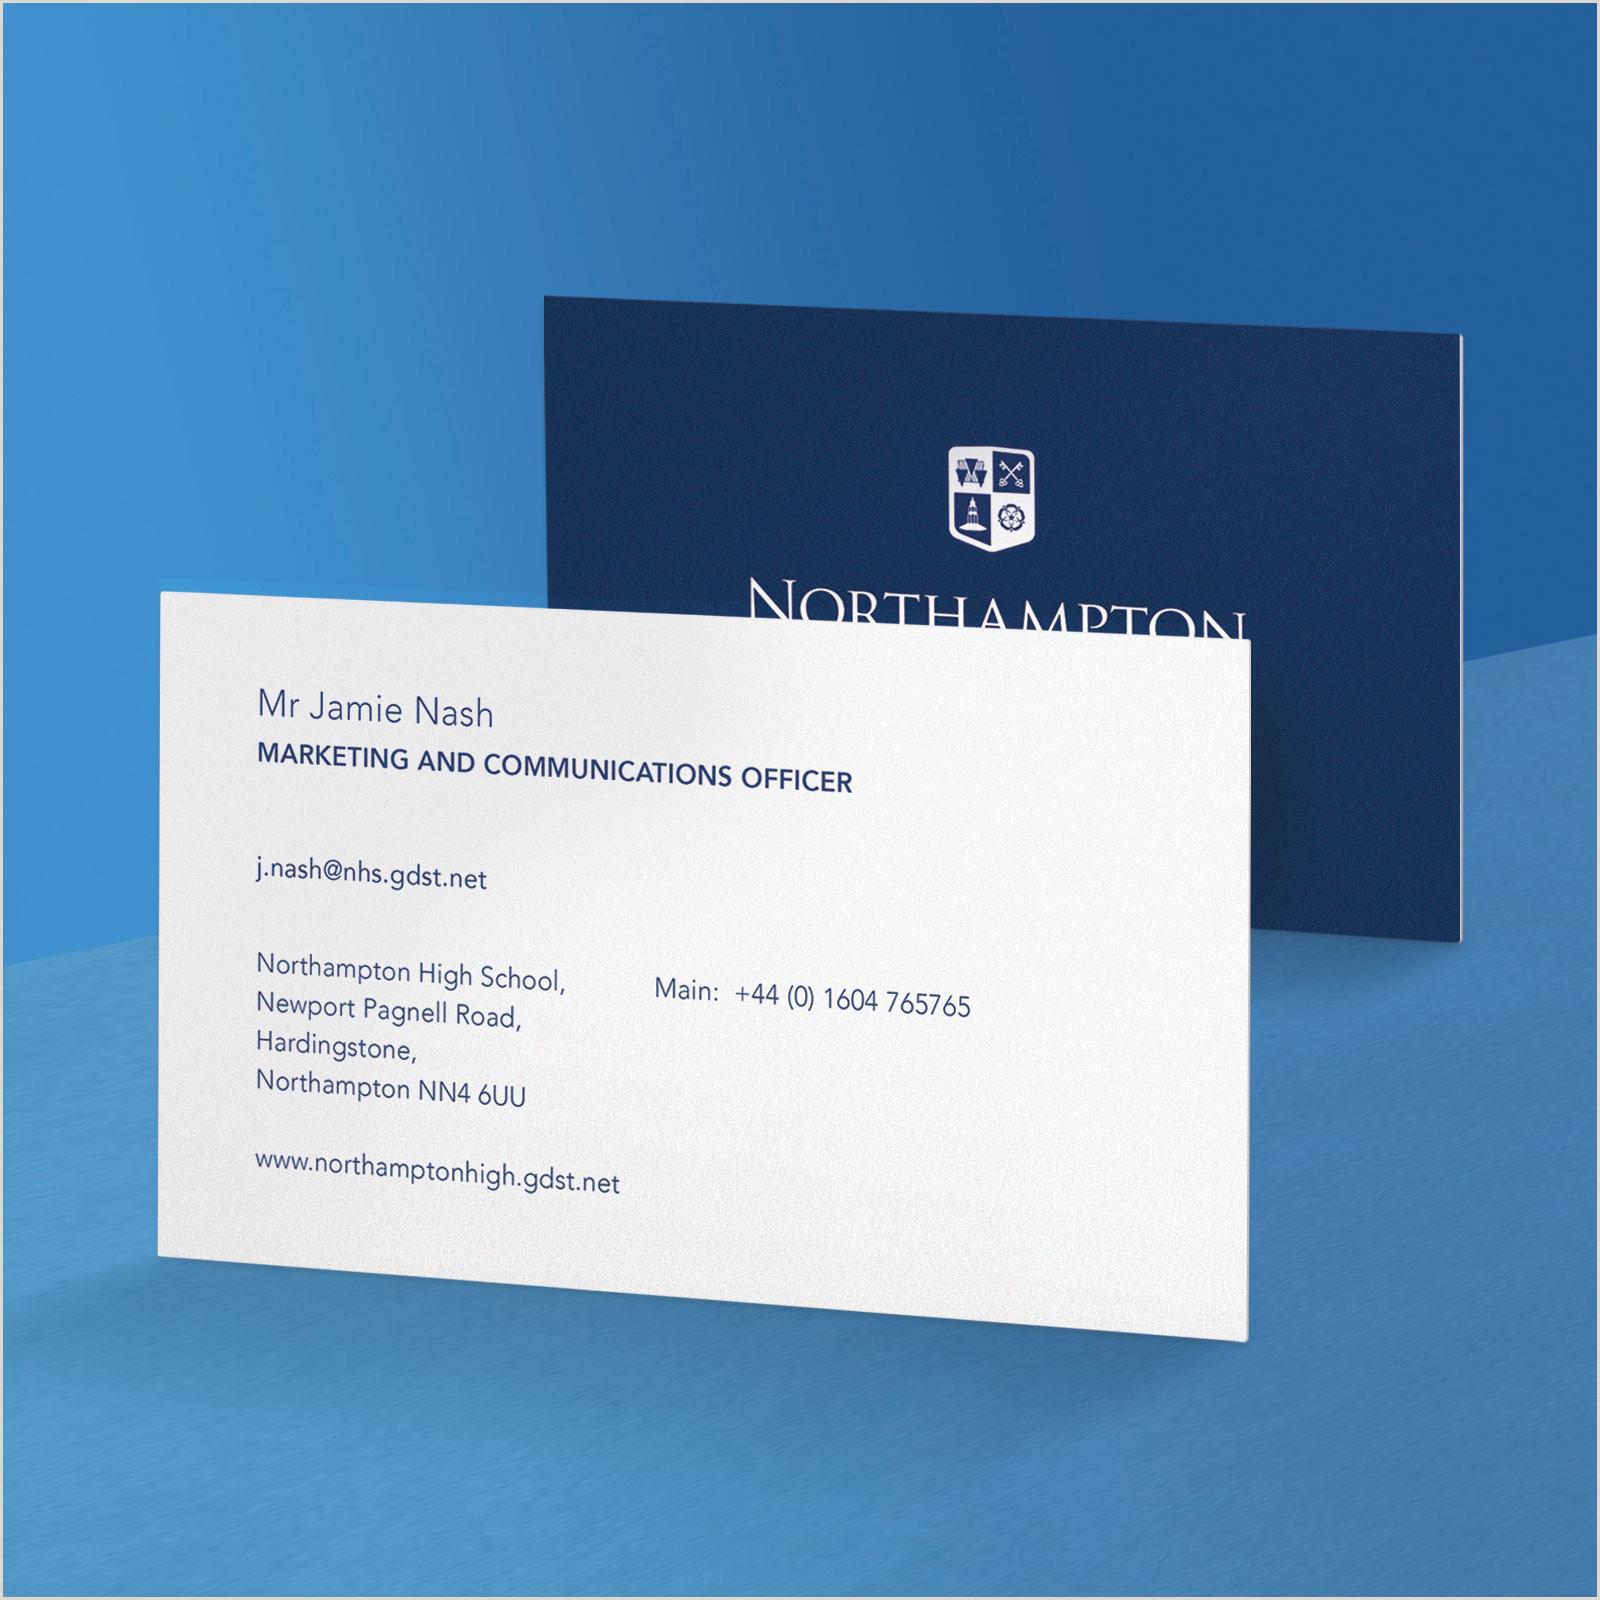 Businesd Cards Upload A Design Eco Business Cards